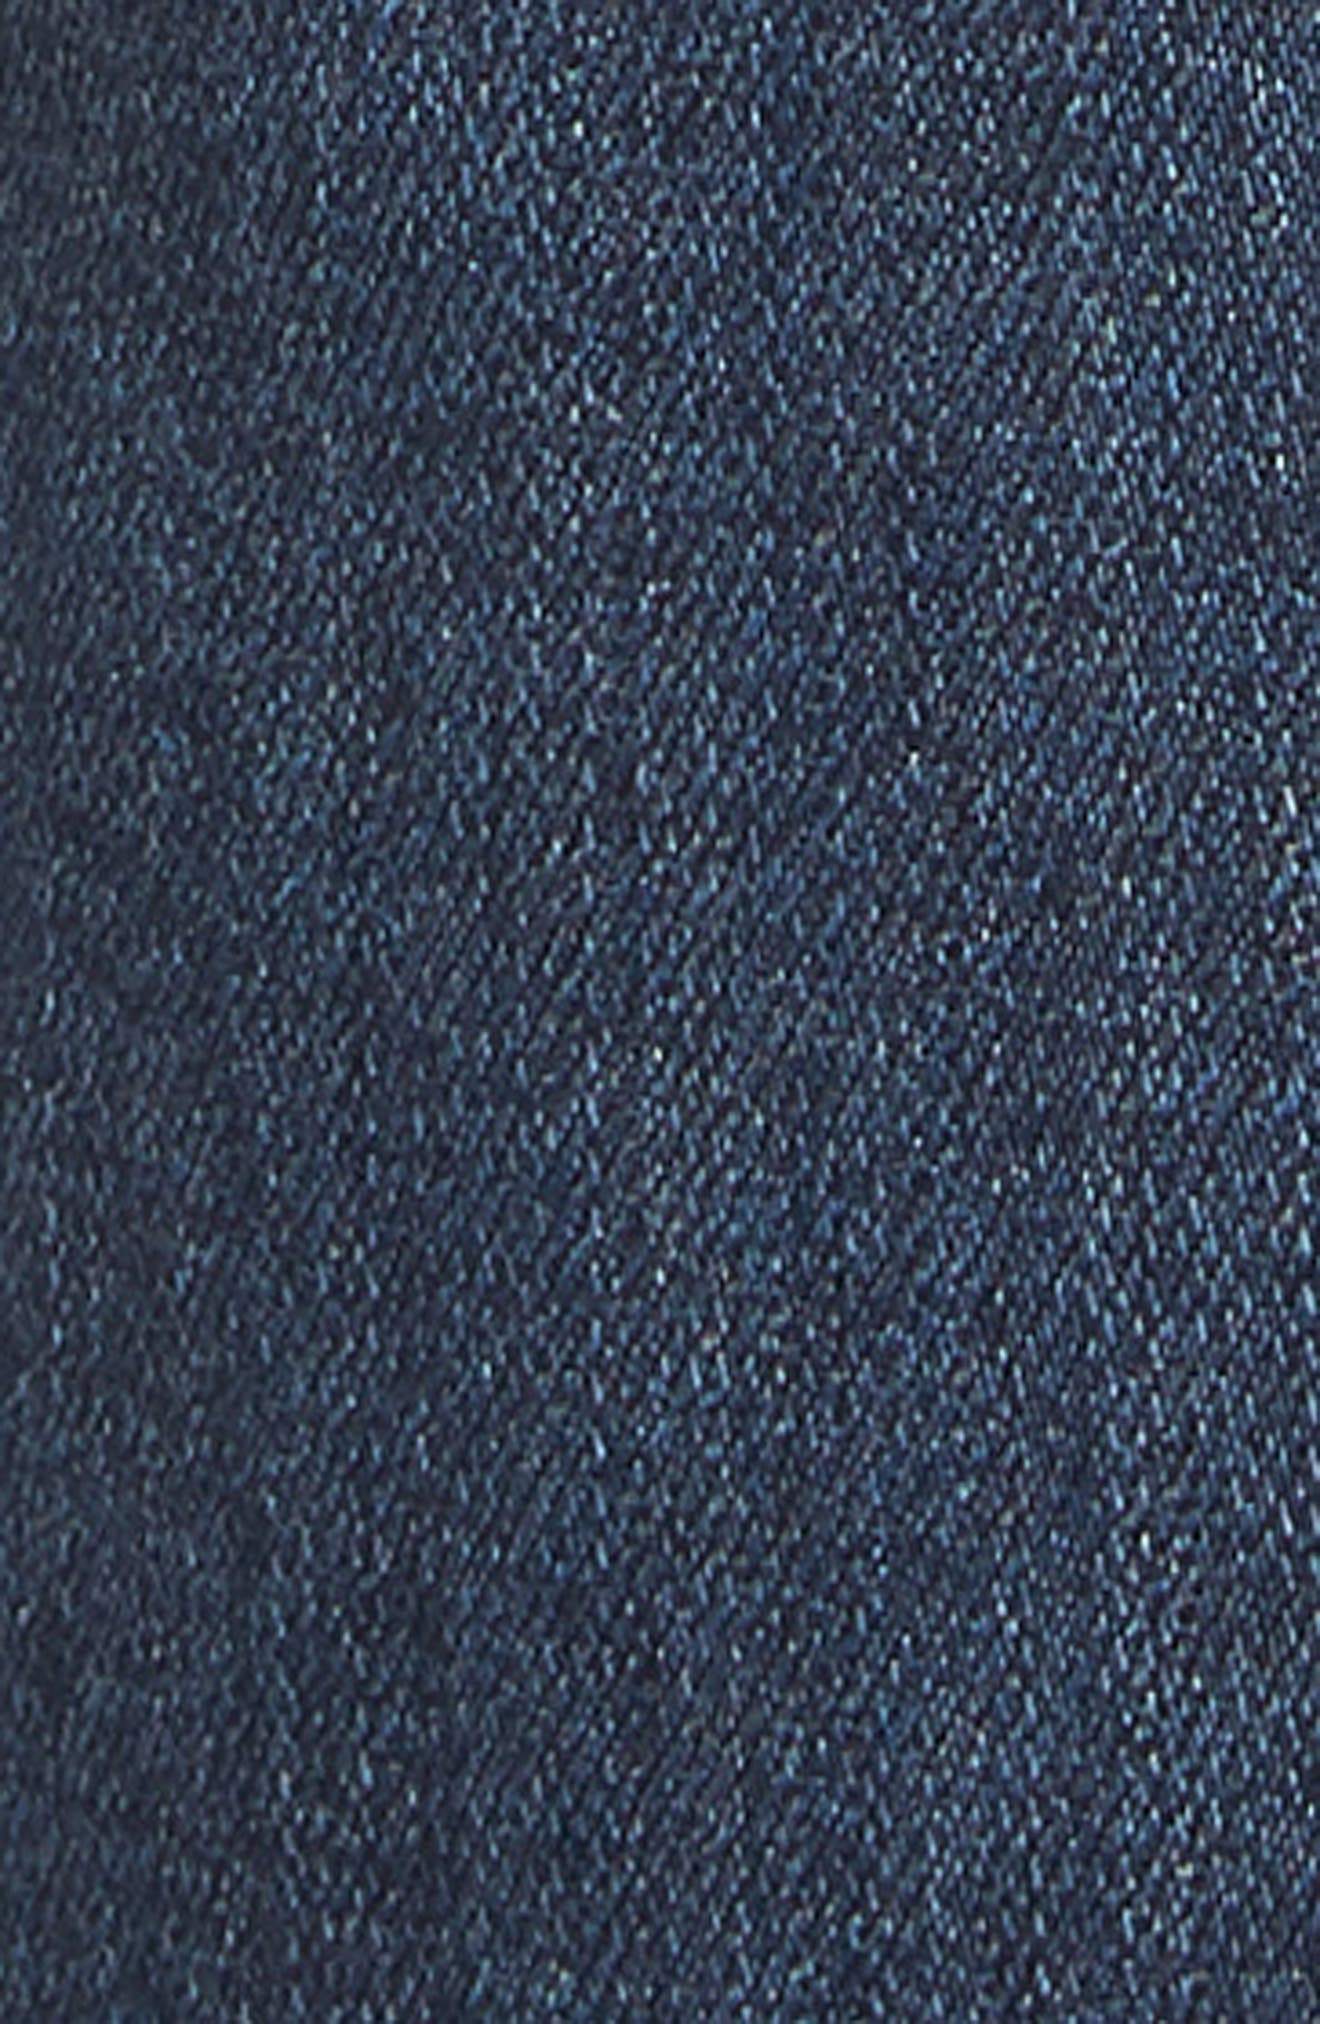 Transcend - Lennox Slim Fit Jeans,                             Alternate thumbnail 5, color,                             GRAMMERCY